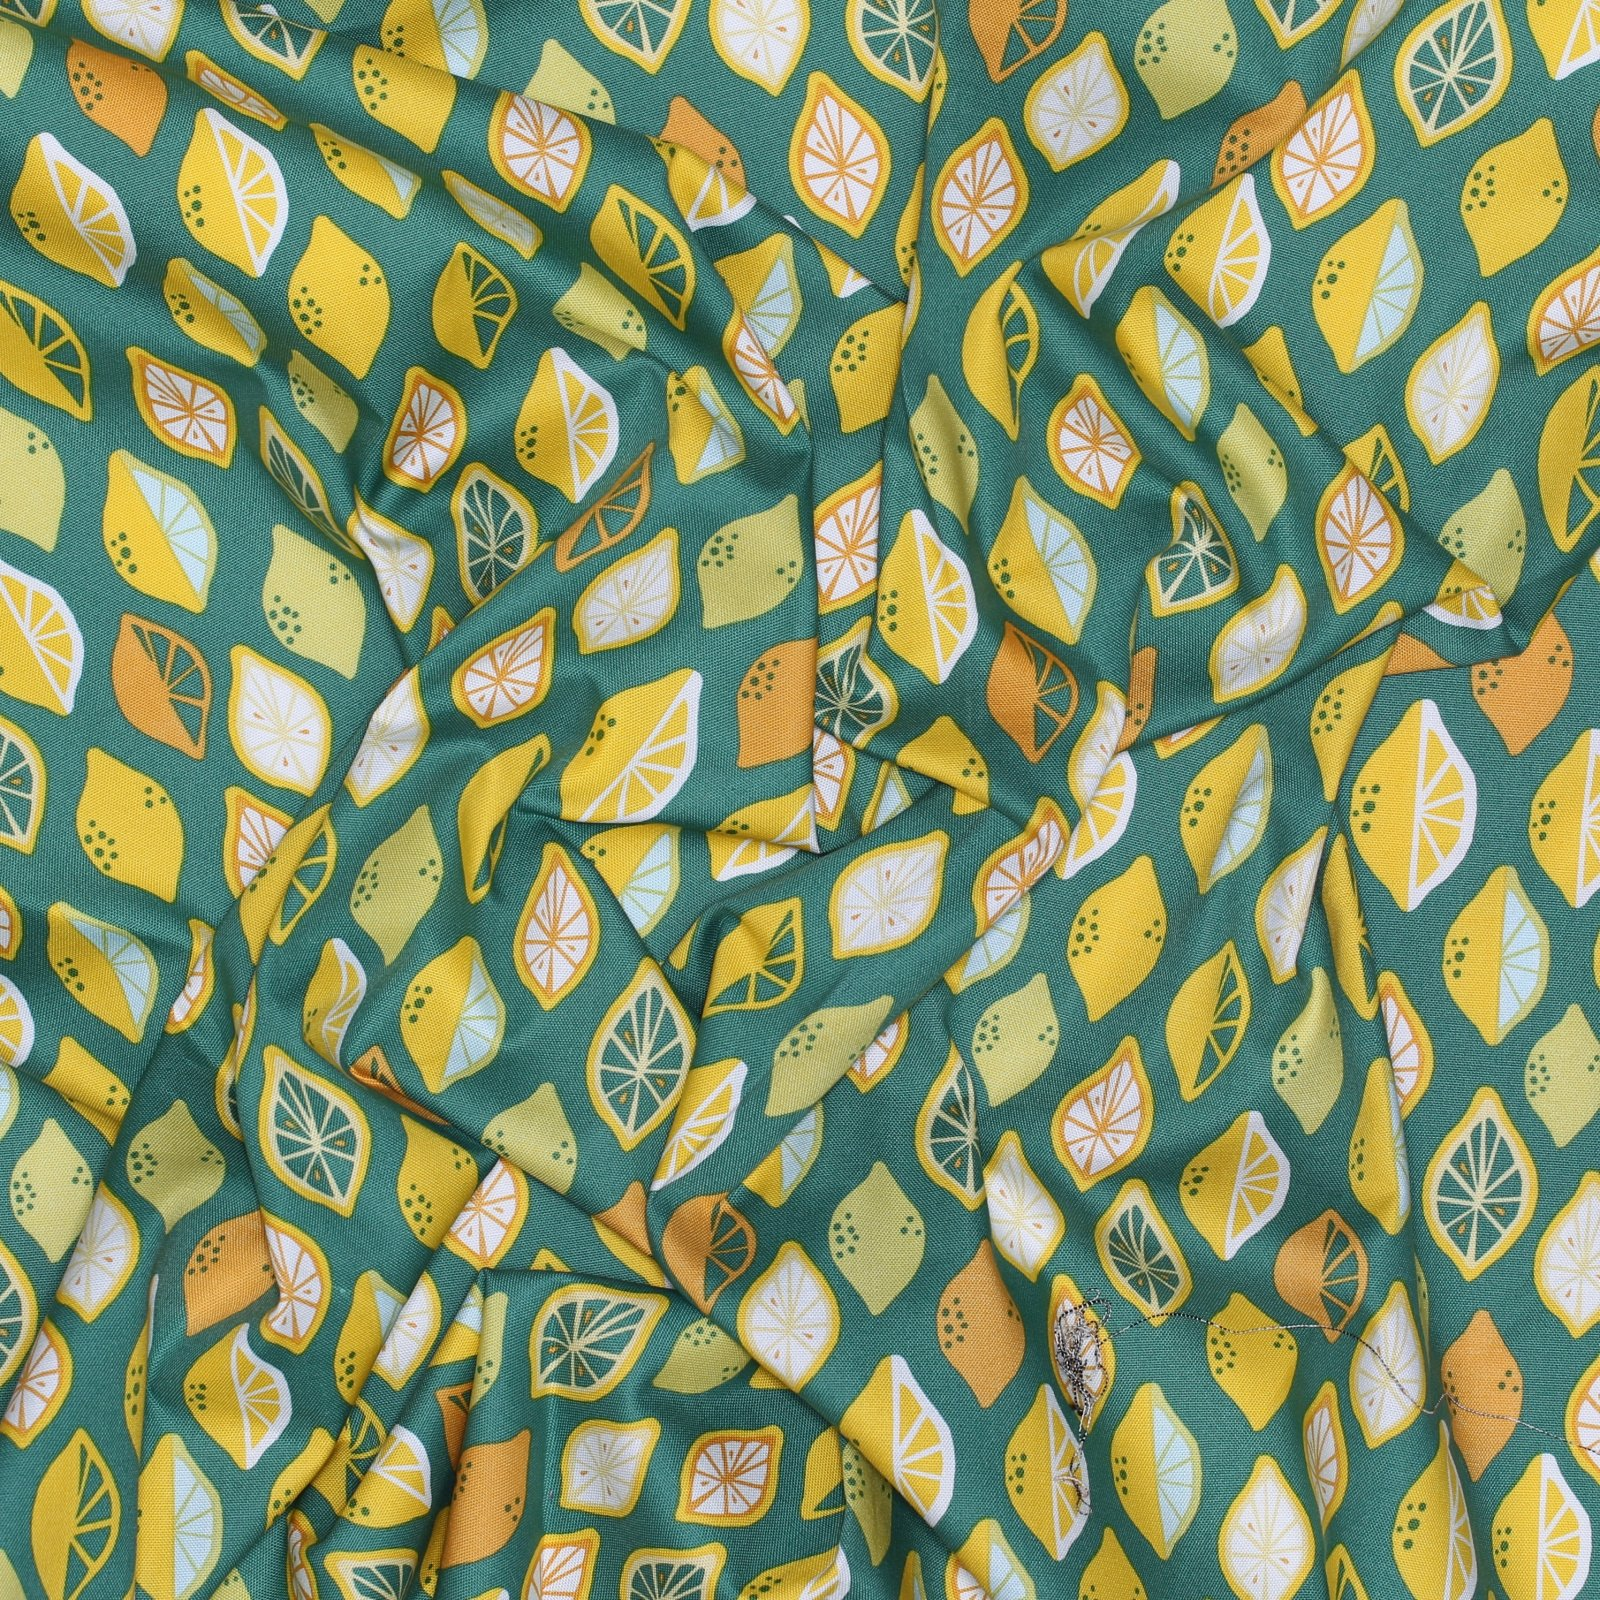 Monaluna Organic Fabric - Lemon-Lime Cotton Canvas